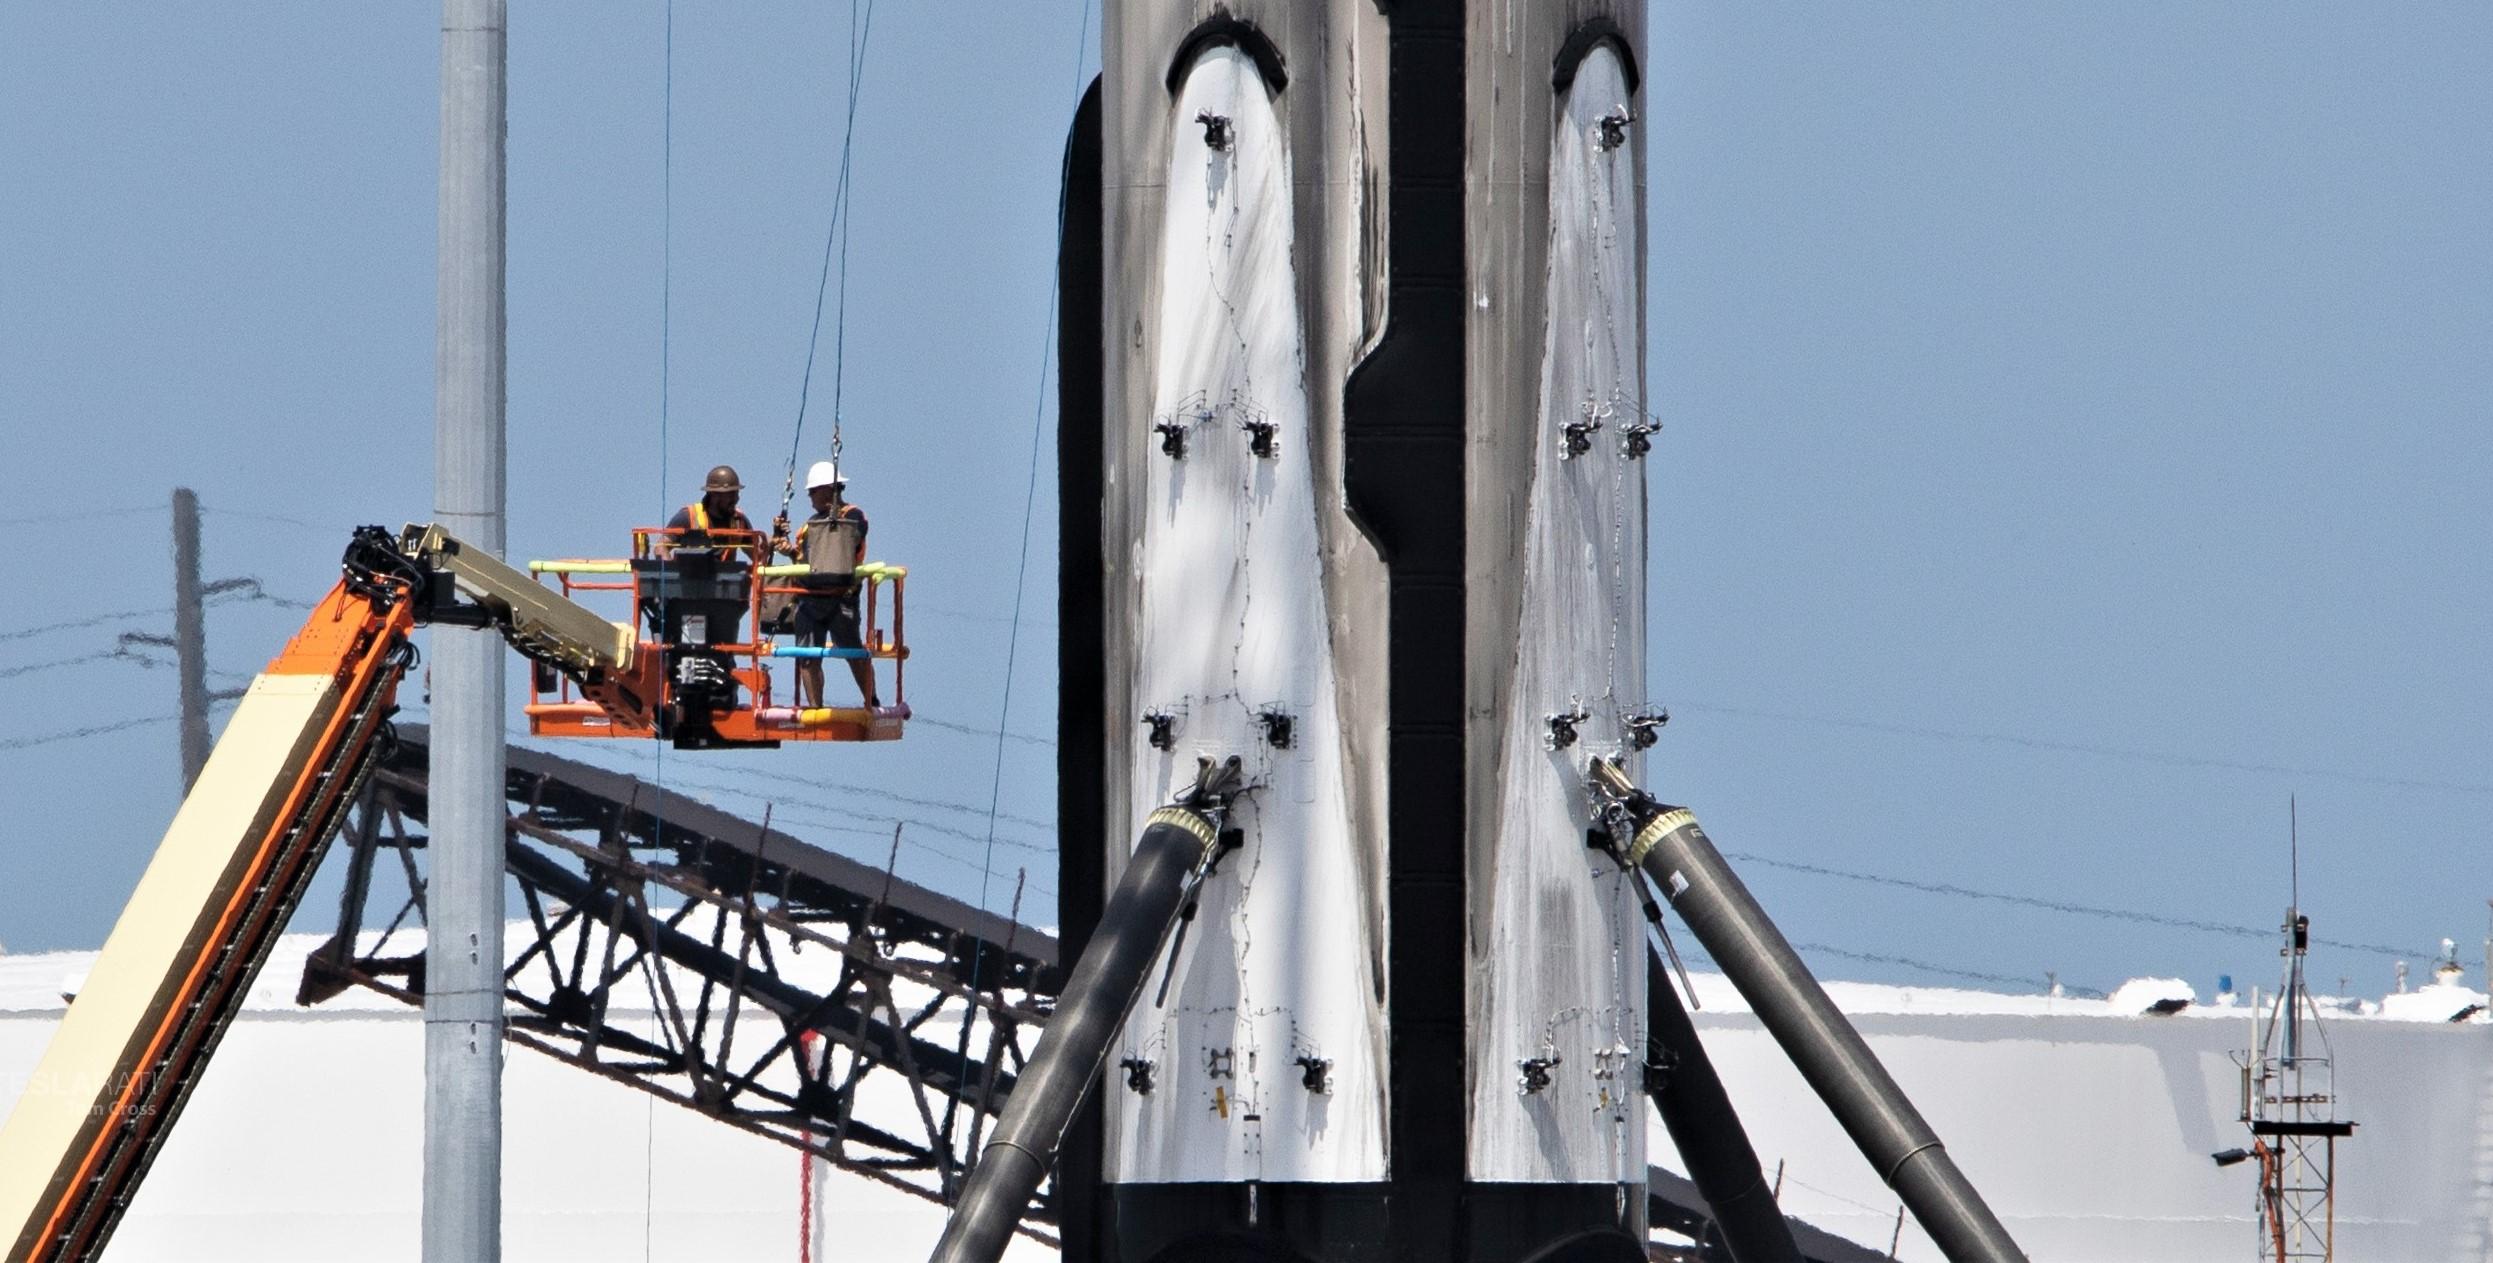 Falcon 9 b1056 leg retraction 1 of 4 050719 (Tom Cross) 3